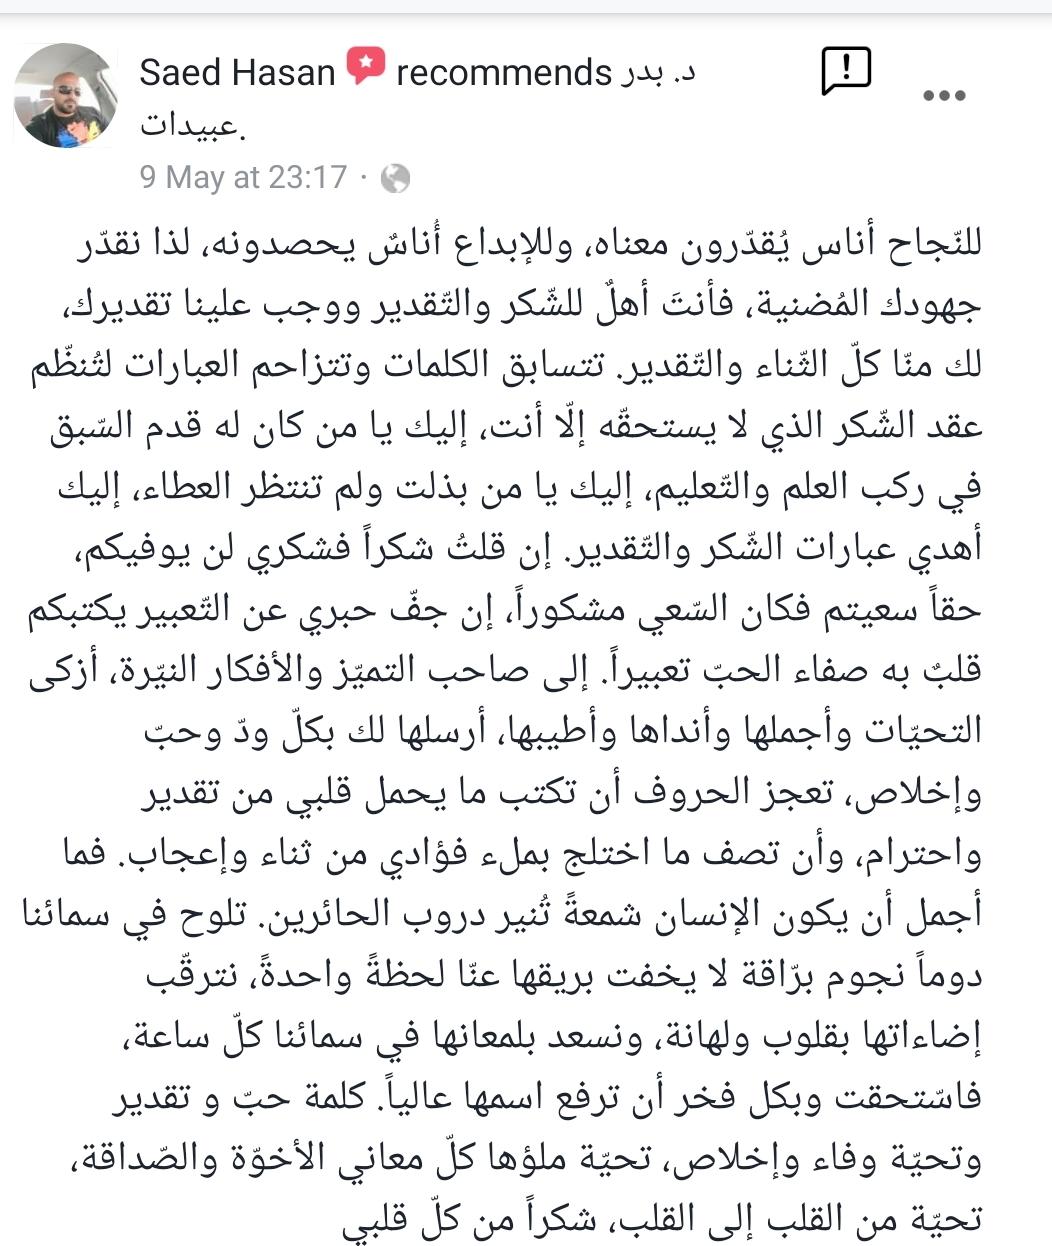 SmartSelect_20191205-204358_Facebook